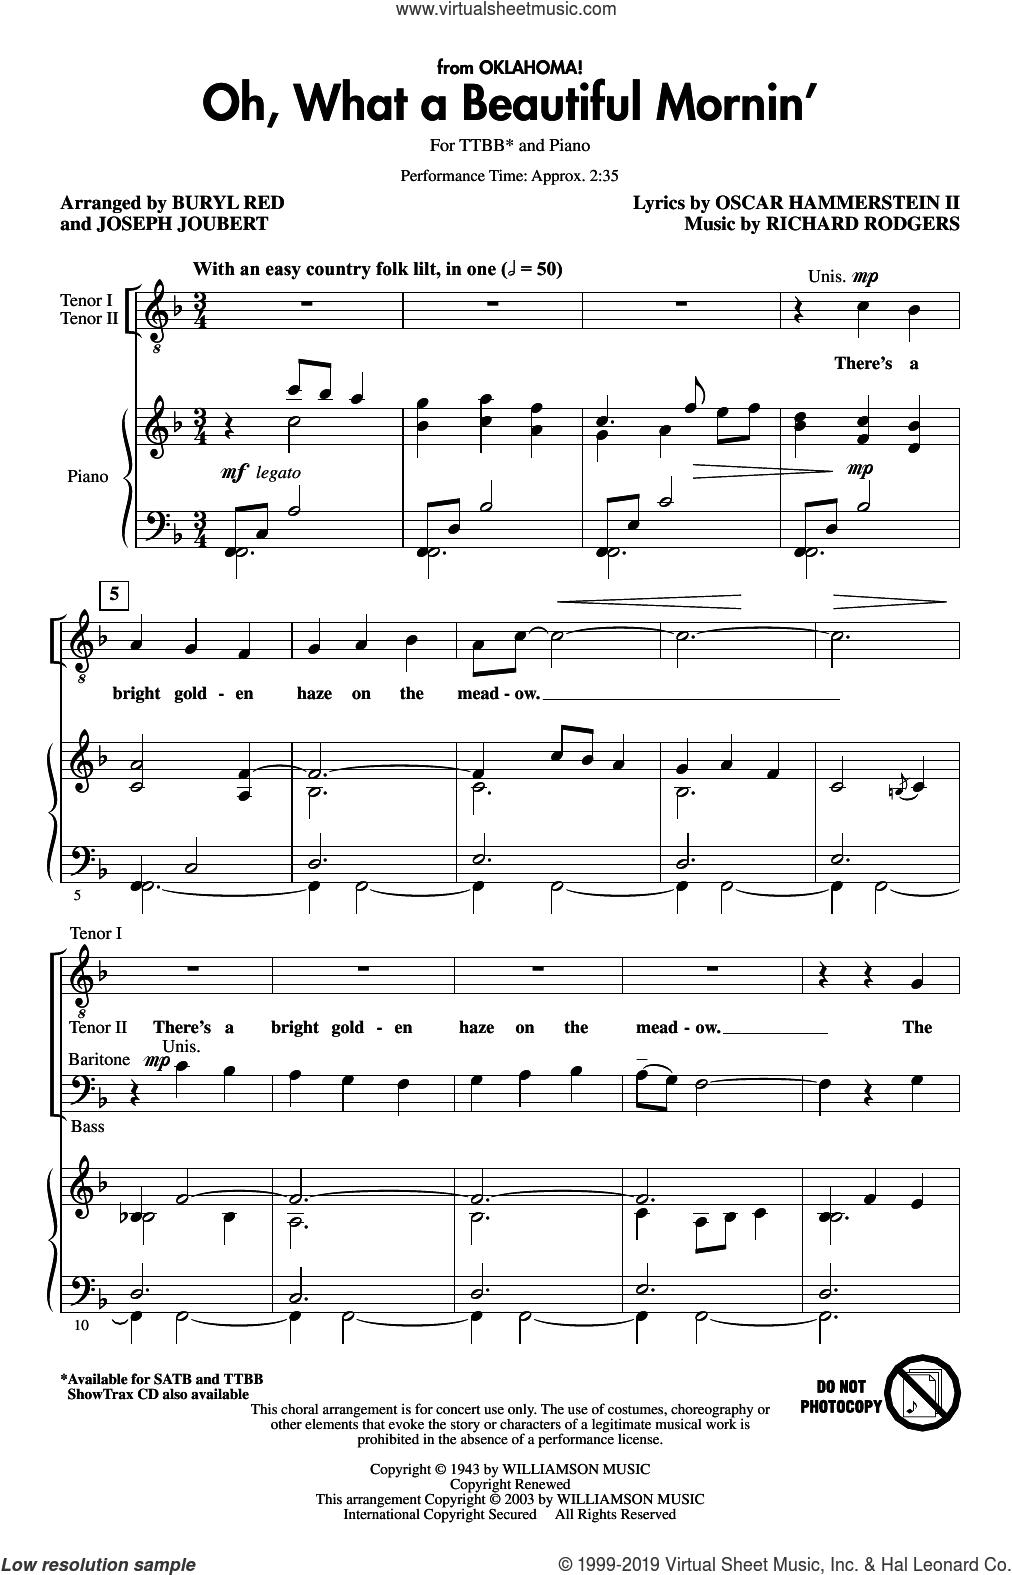 Oh, What A Beautiful Mornin' (from Oklahoma) (arr. Buryl Red and Joseph Joubert) sheet music for choir (TTBB: tenor, bass) by Rodgers & Hammerstein, Buryl Red, Joseph Joubert, Oscar II Hammerstein and Richard Rodgers, intermediate skill level